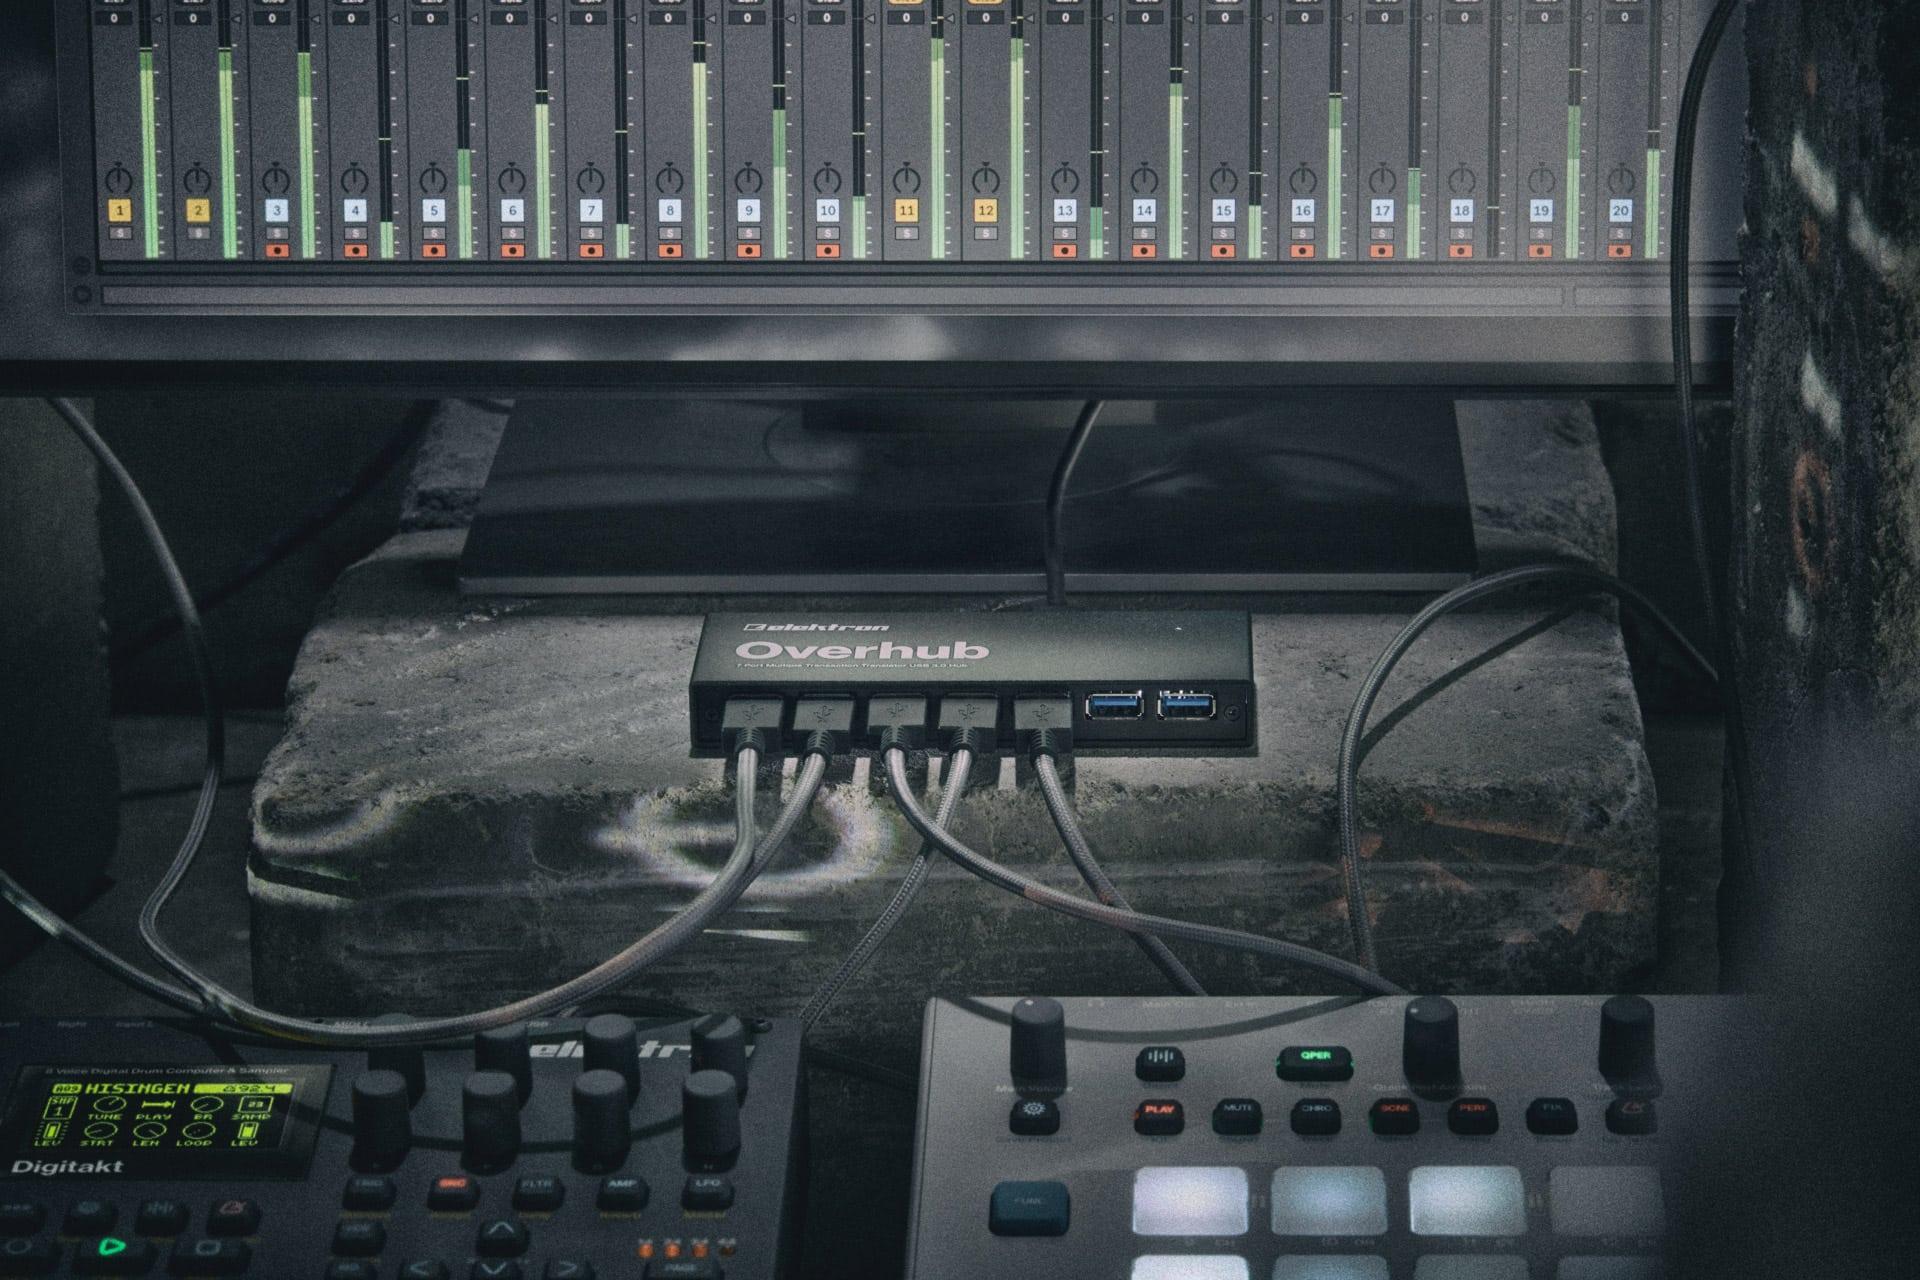 Overbridge bridges the gap between Elektron music hardware and software.